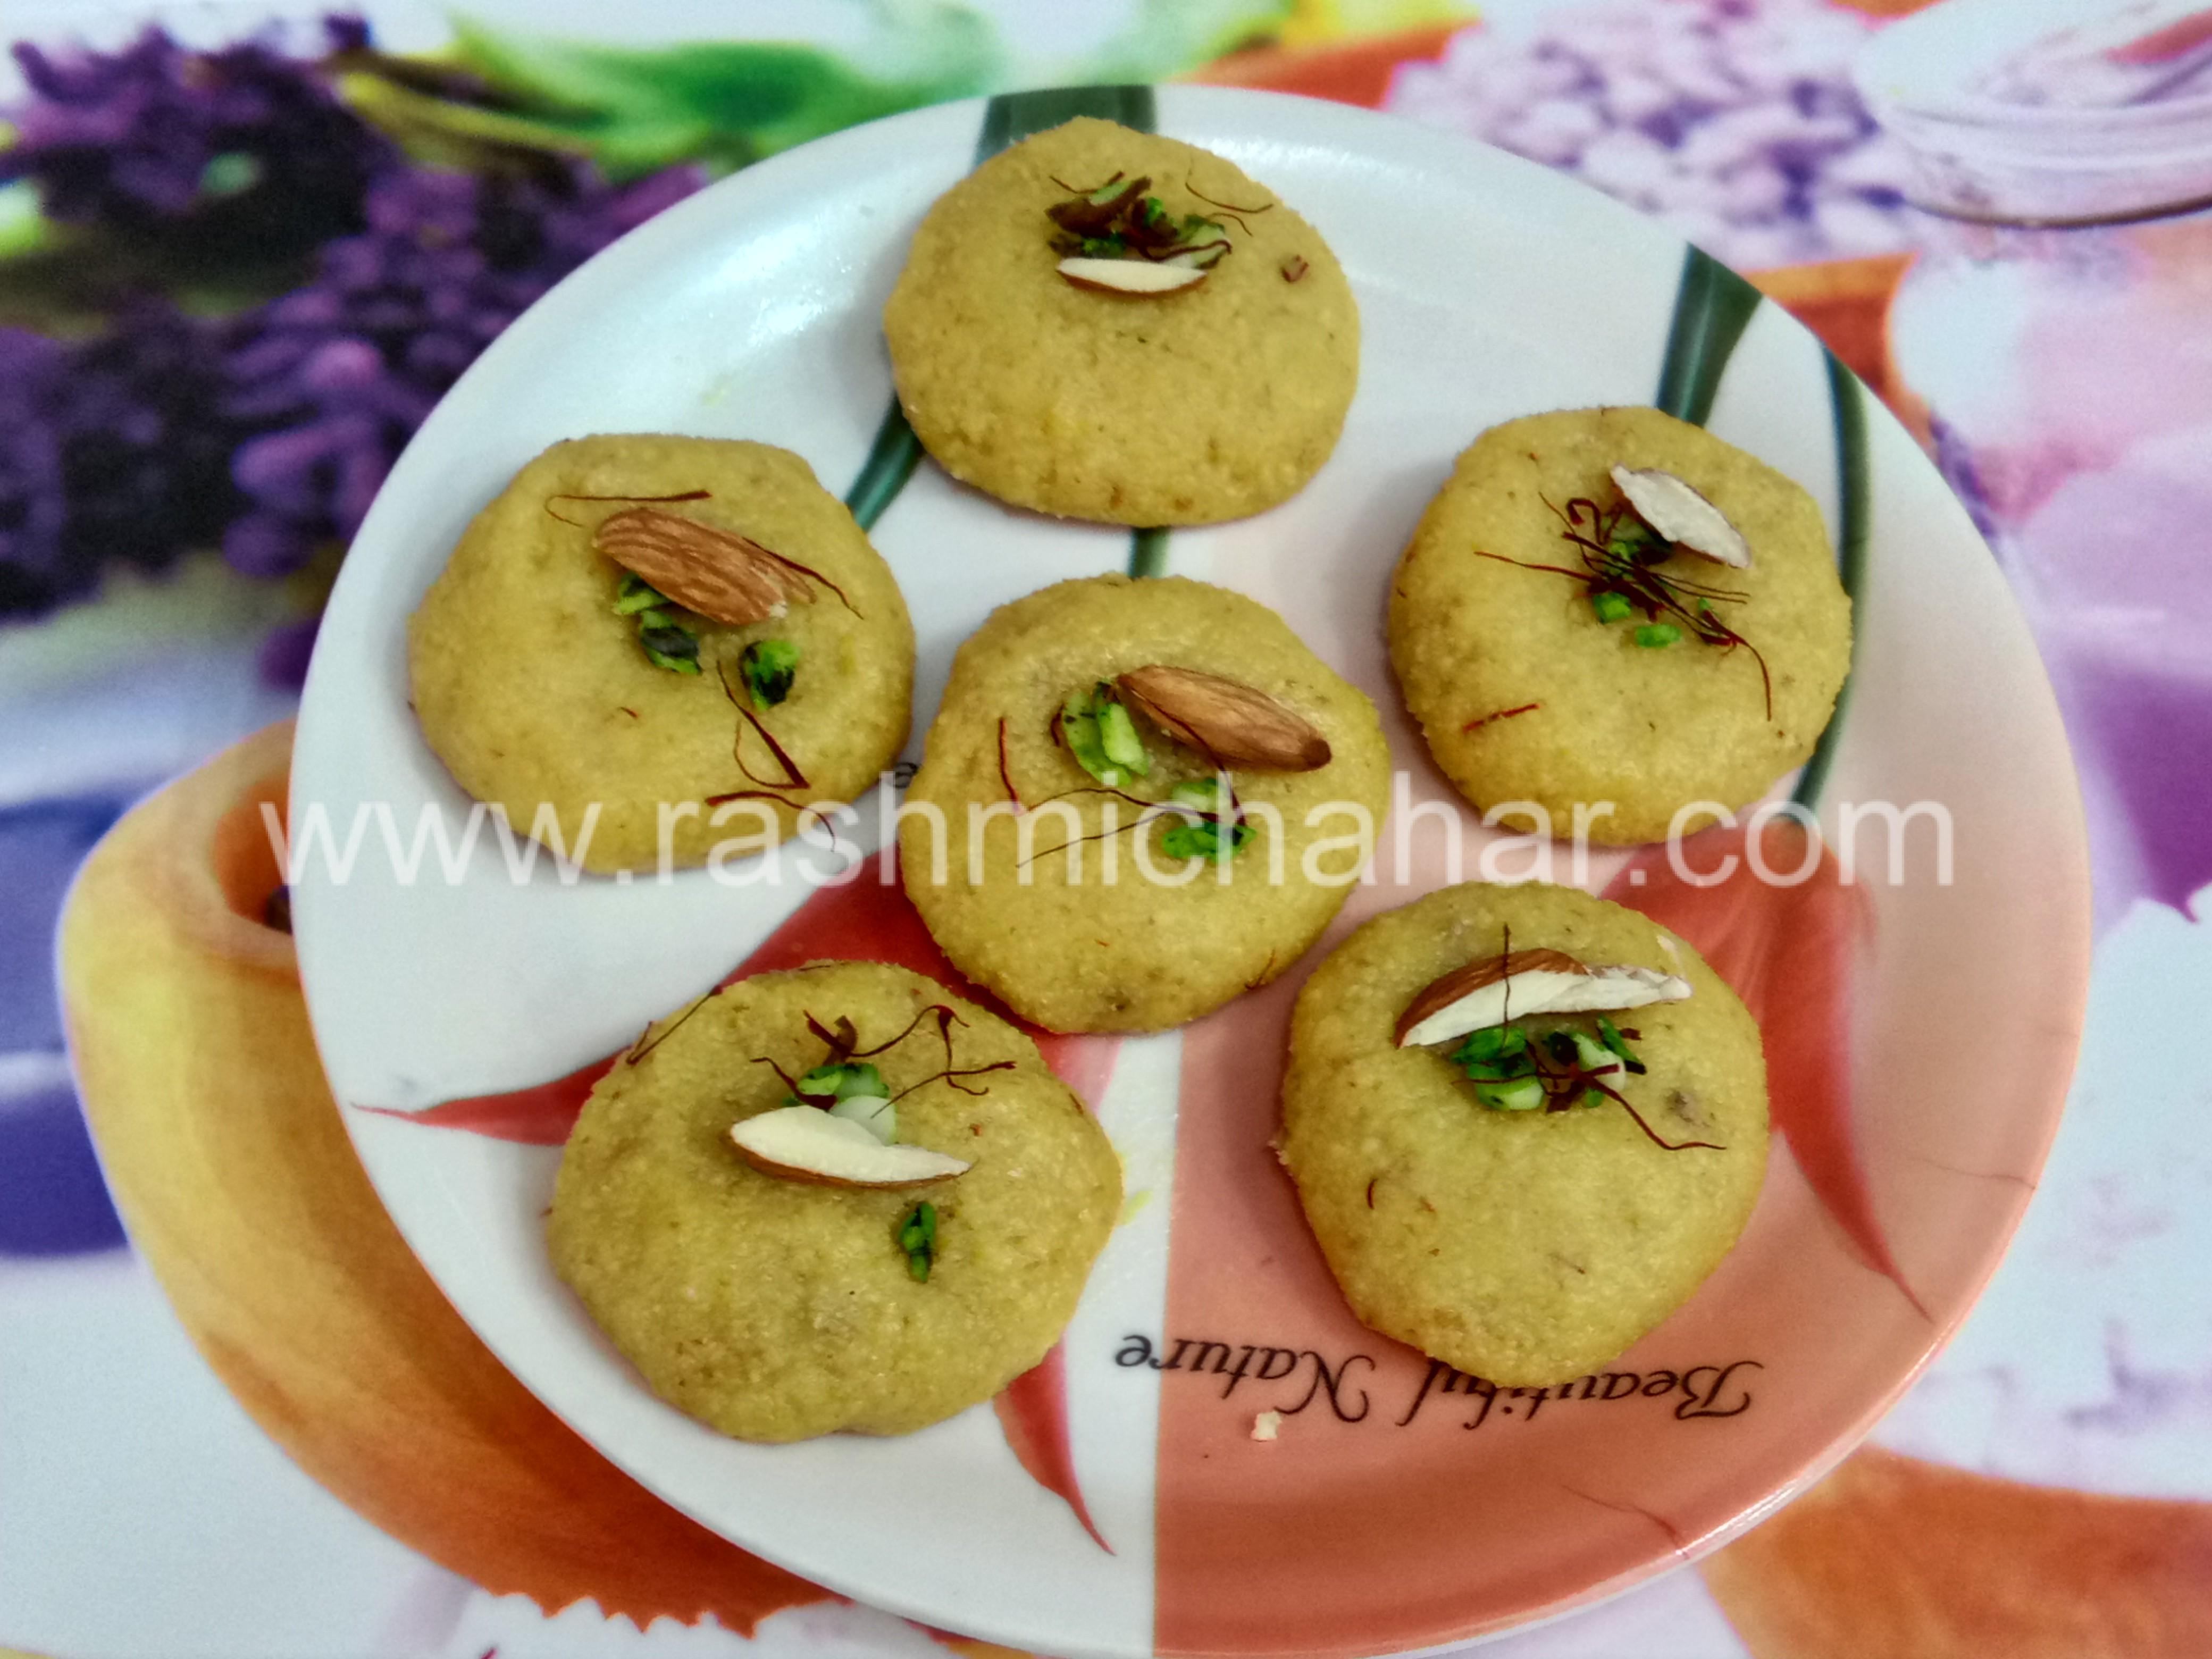 Kesar Peda Saffron Peda by Rashmi Chahar